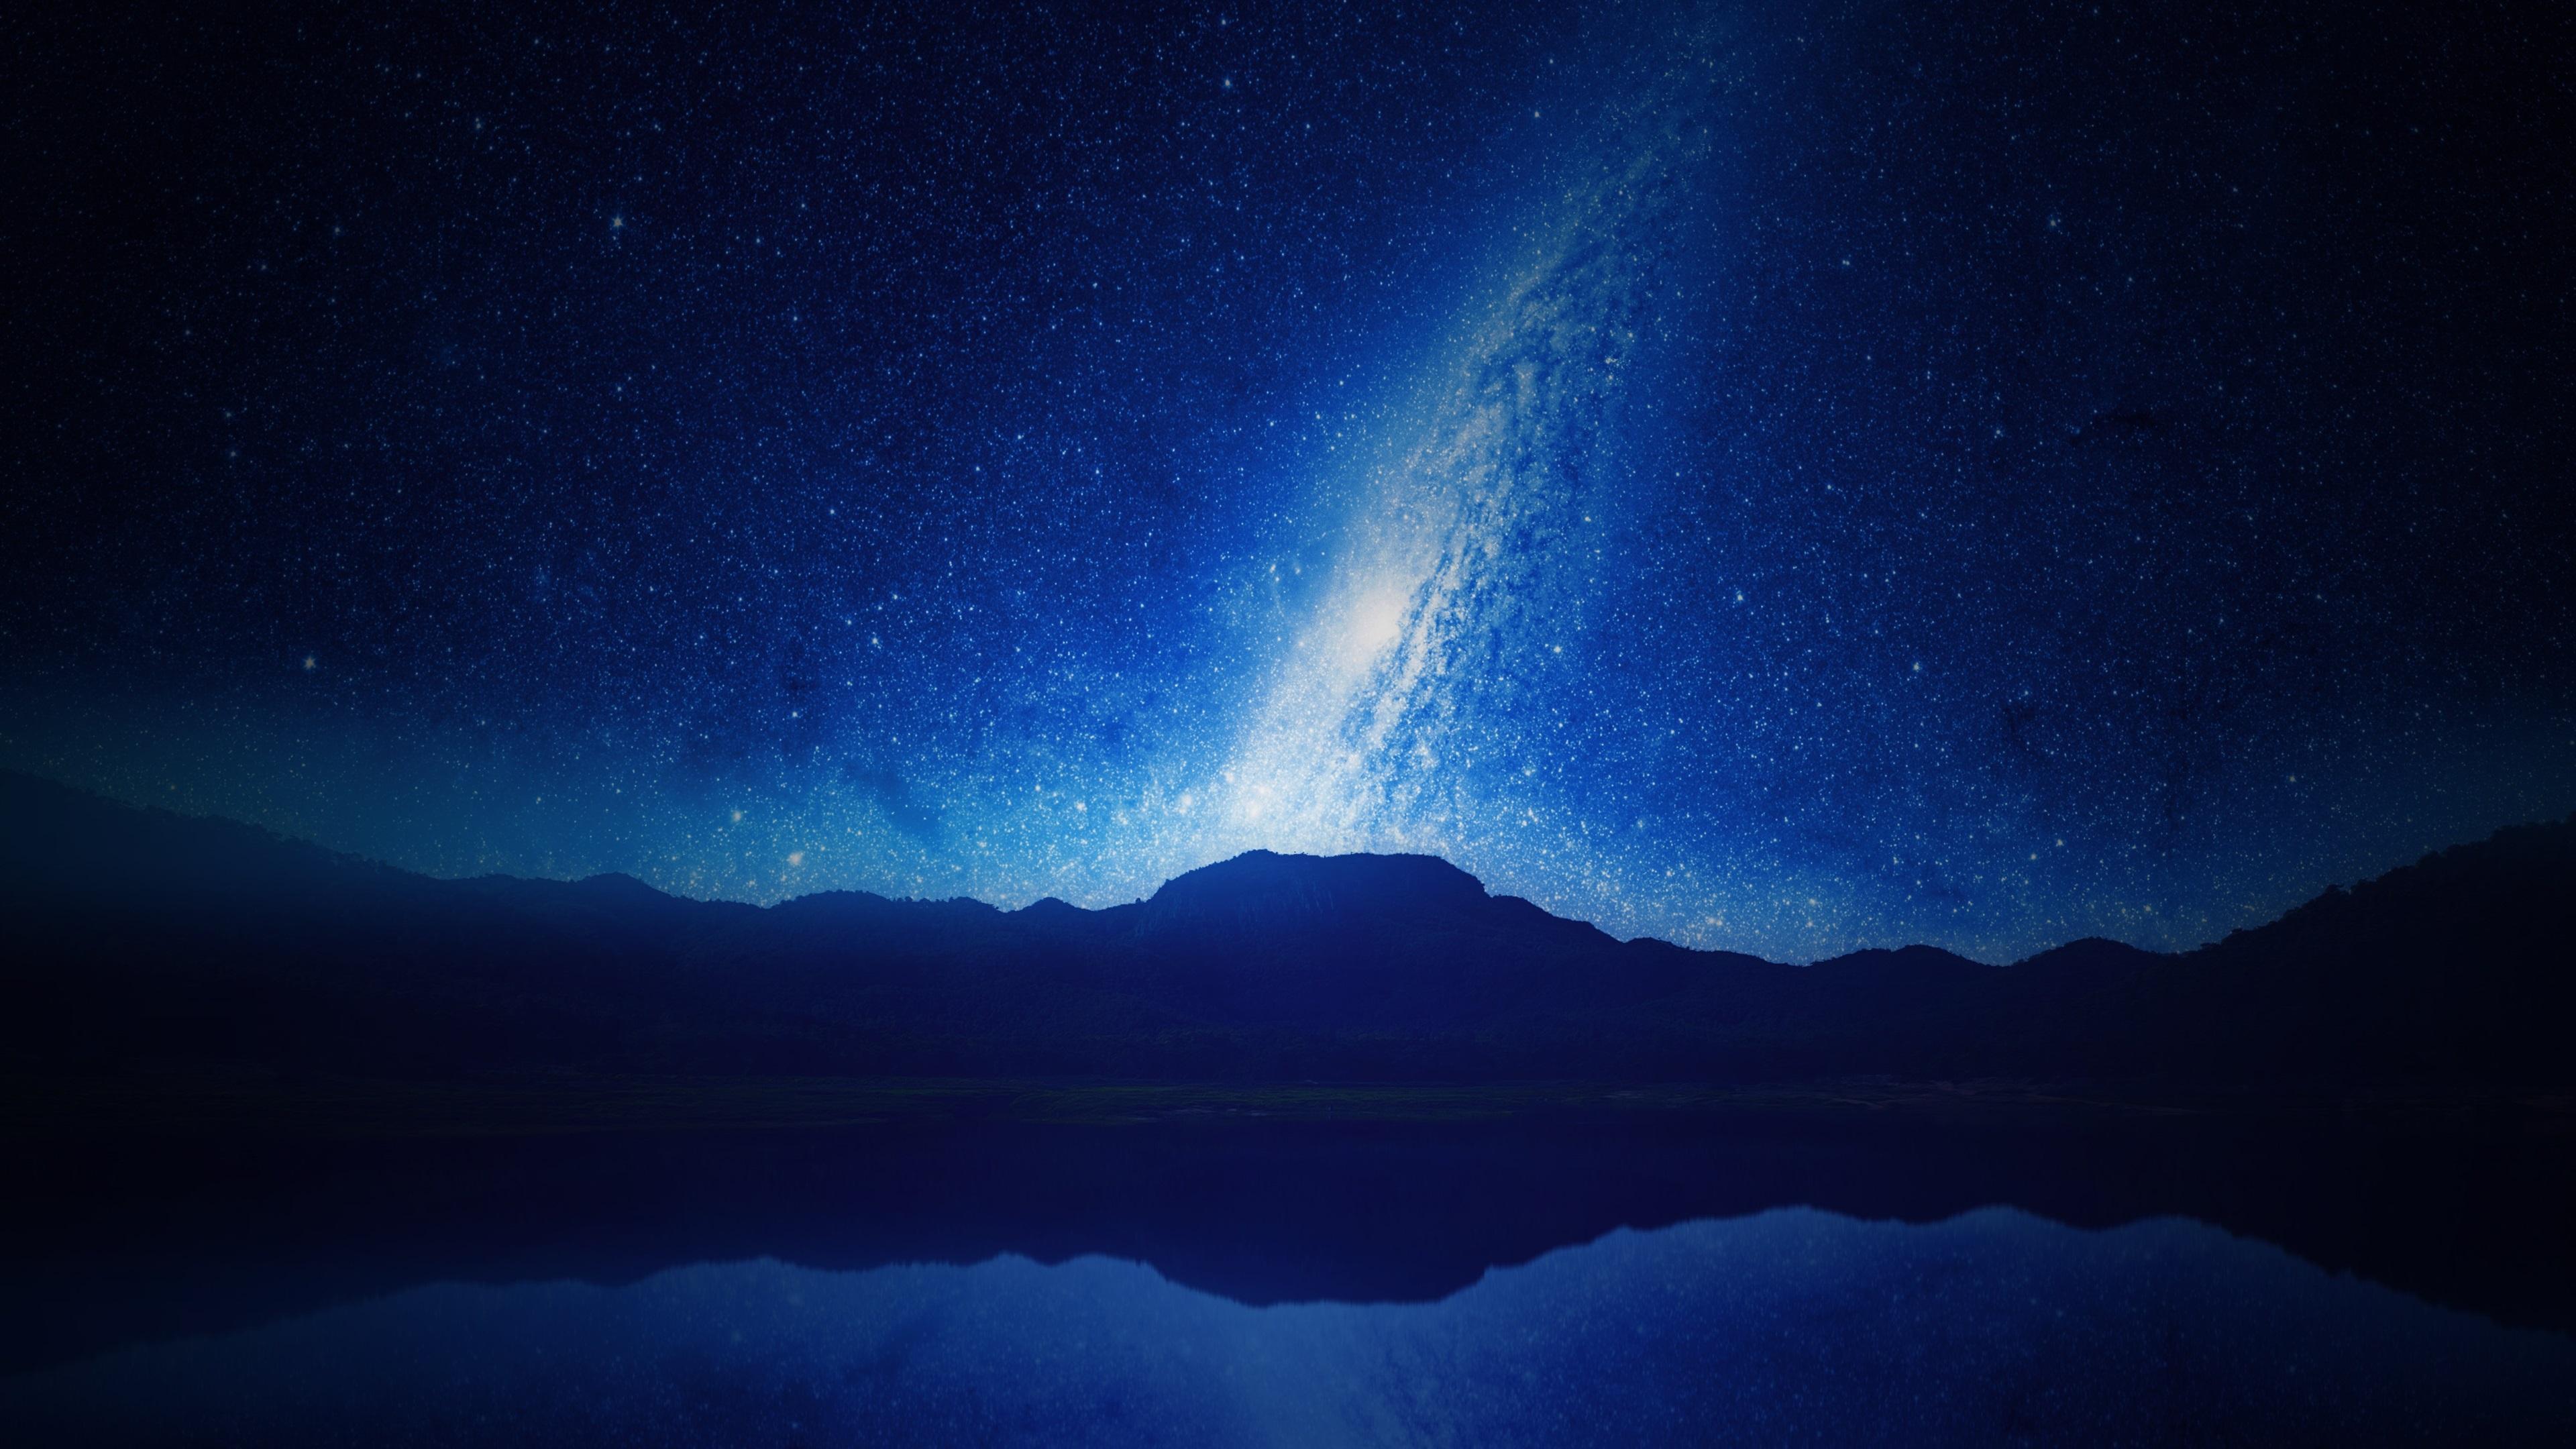 Download wallpaper 3840x2160 night mountains lake - Starry sky 4k ...